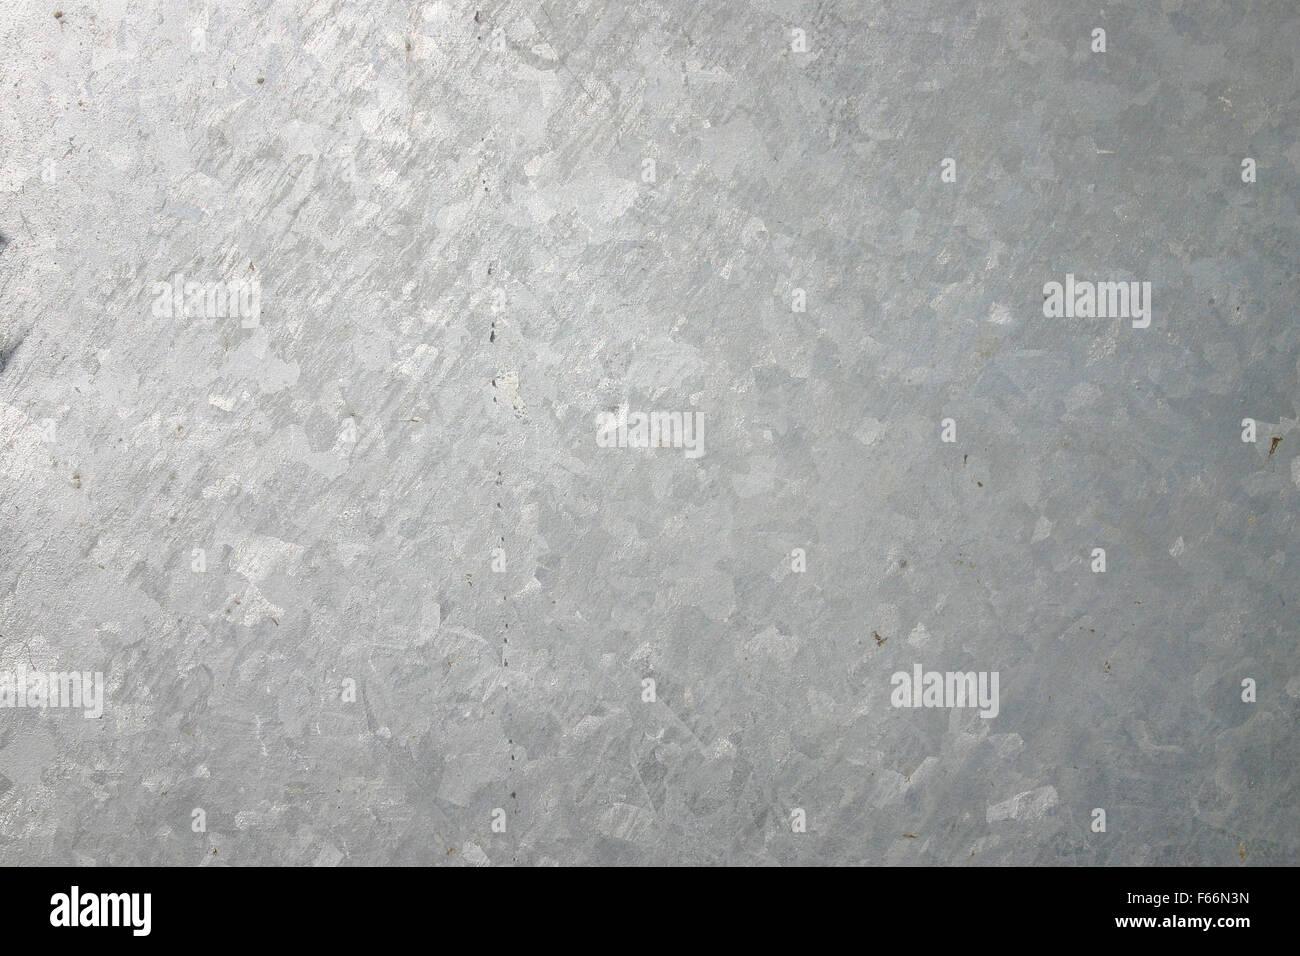 Galvanized plate - Stock Image